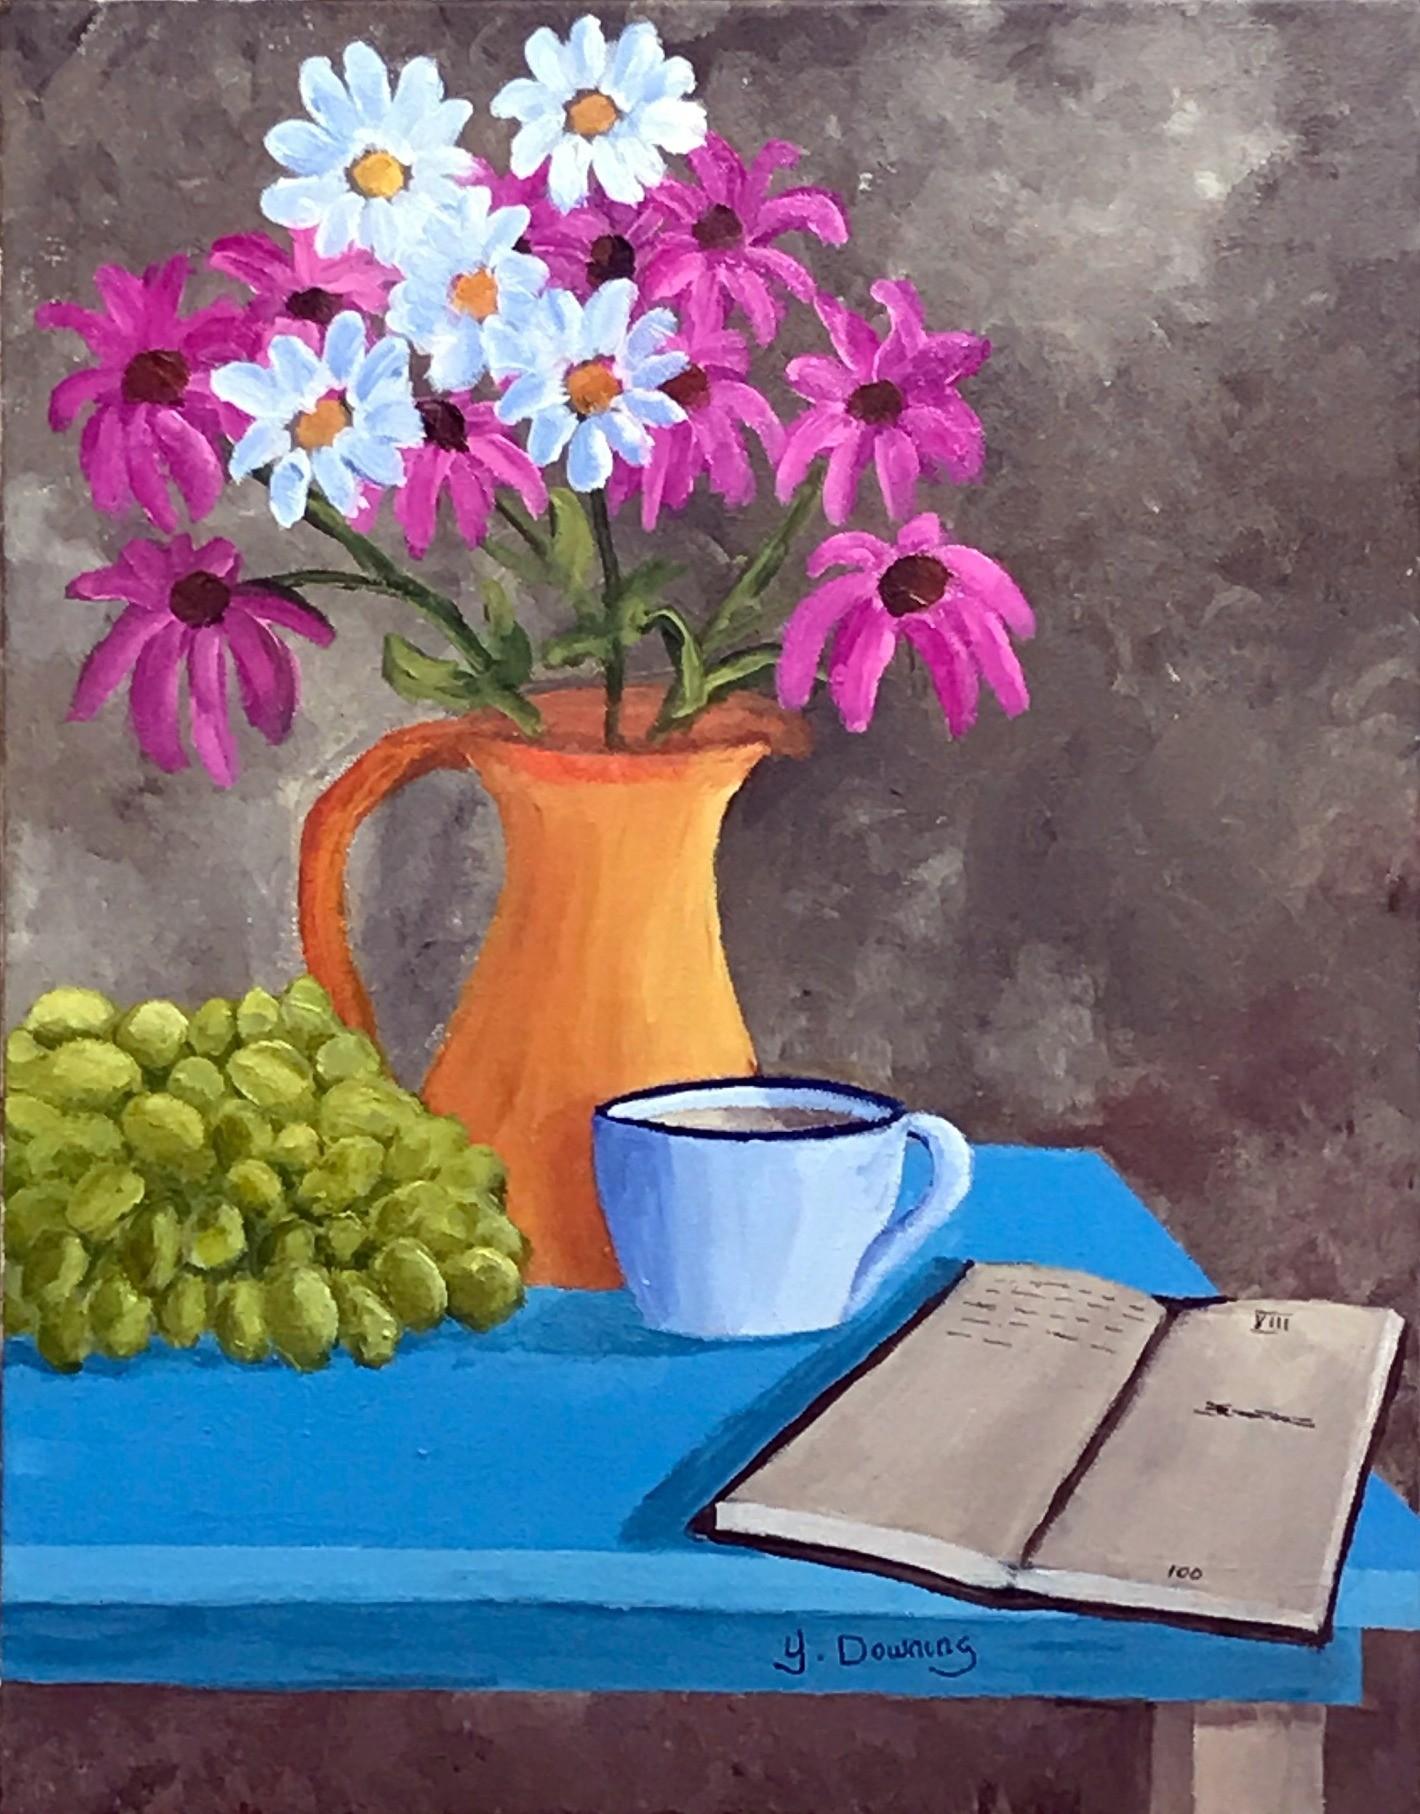 Yves Downing - des fleurs pour toi